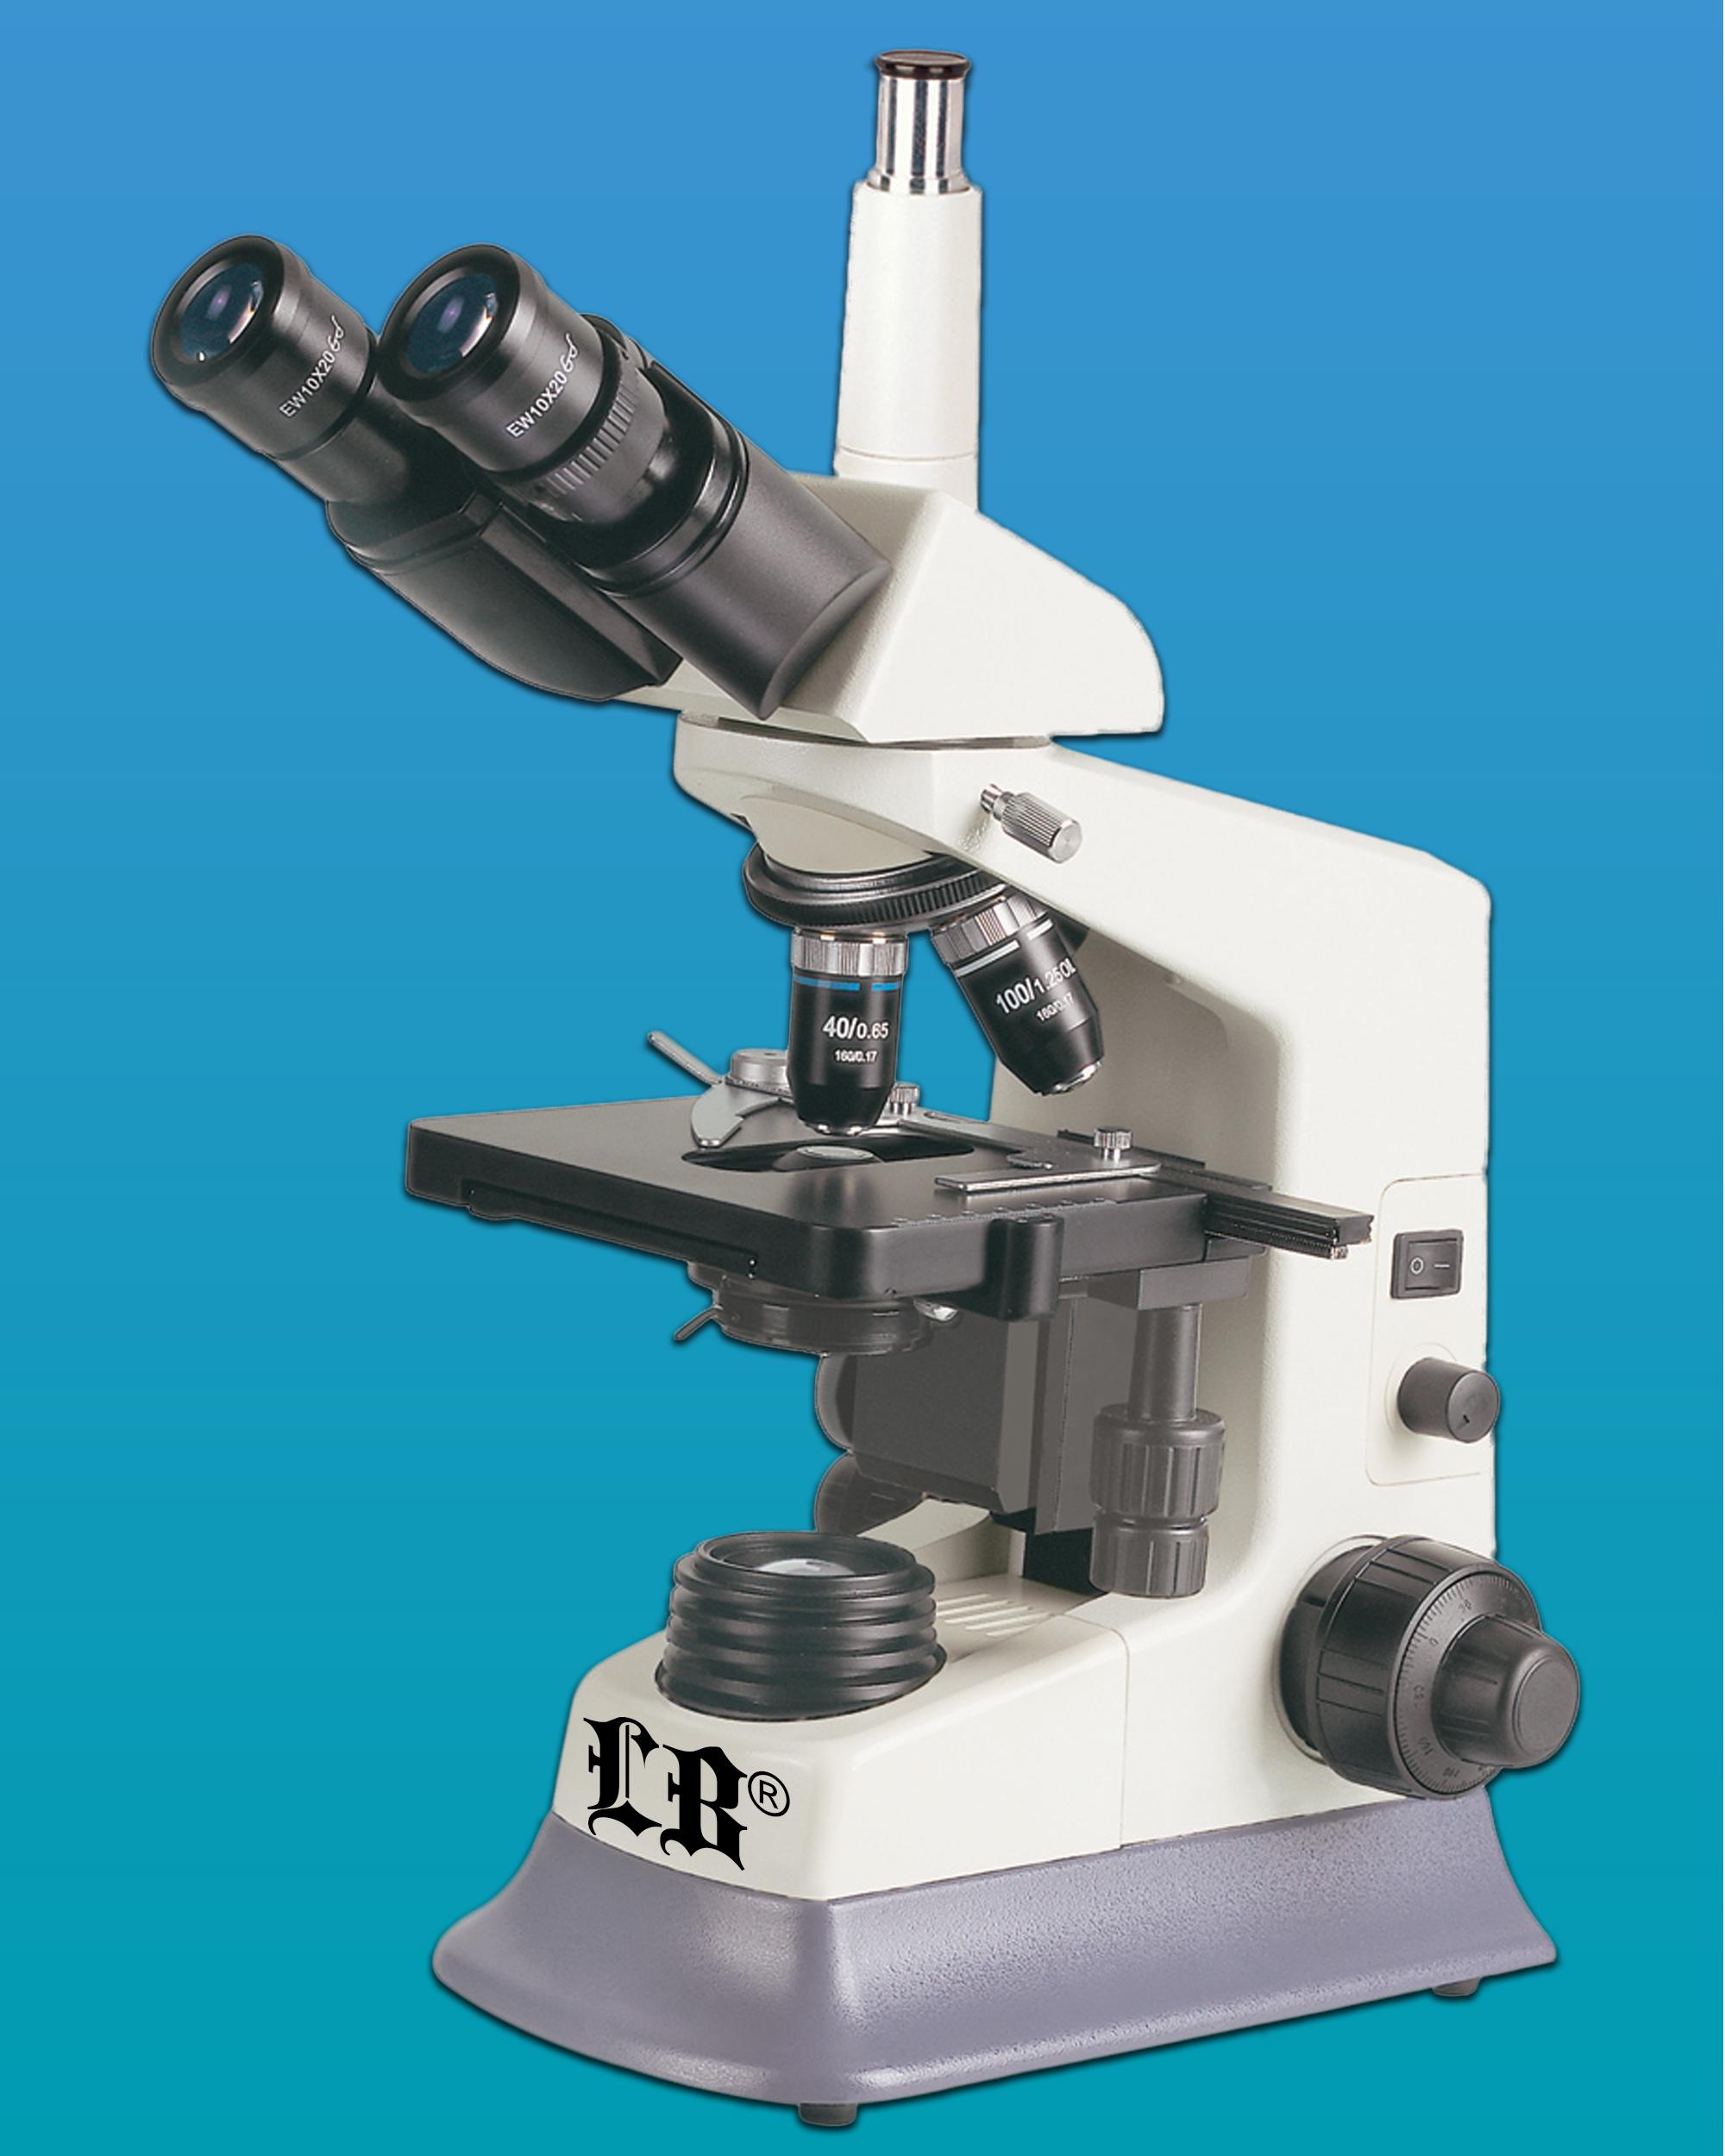 [LB-257] Biological Trinocular Microscope w/ Wide Field, LED Illumination & 6 Plan Achromatic Objectives